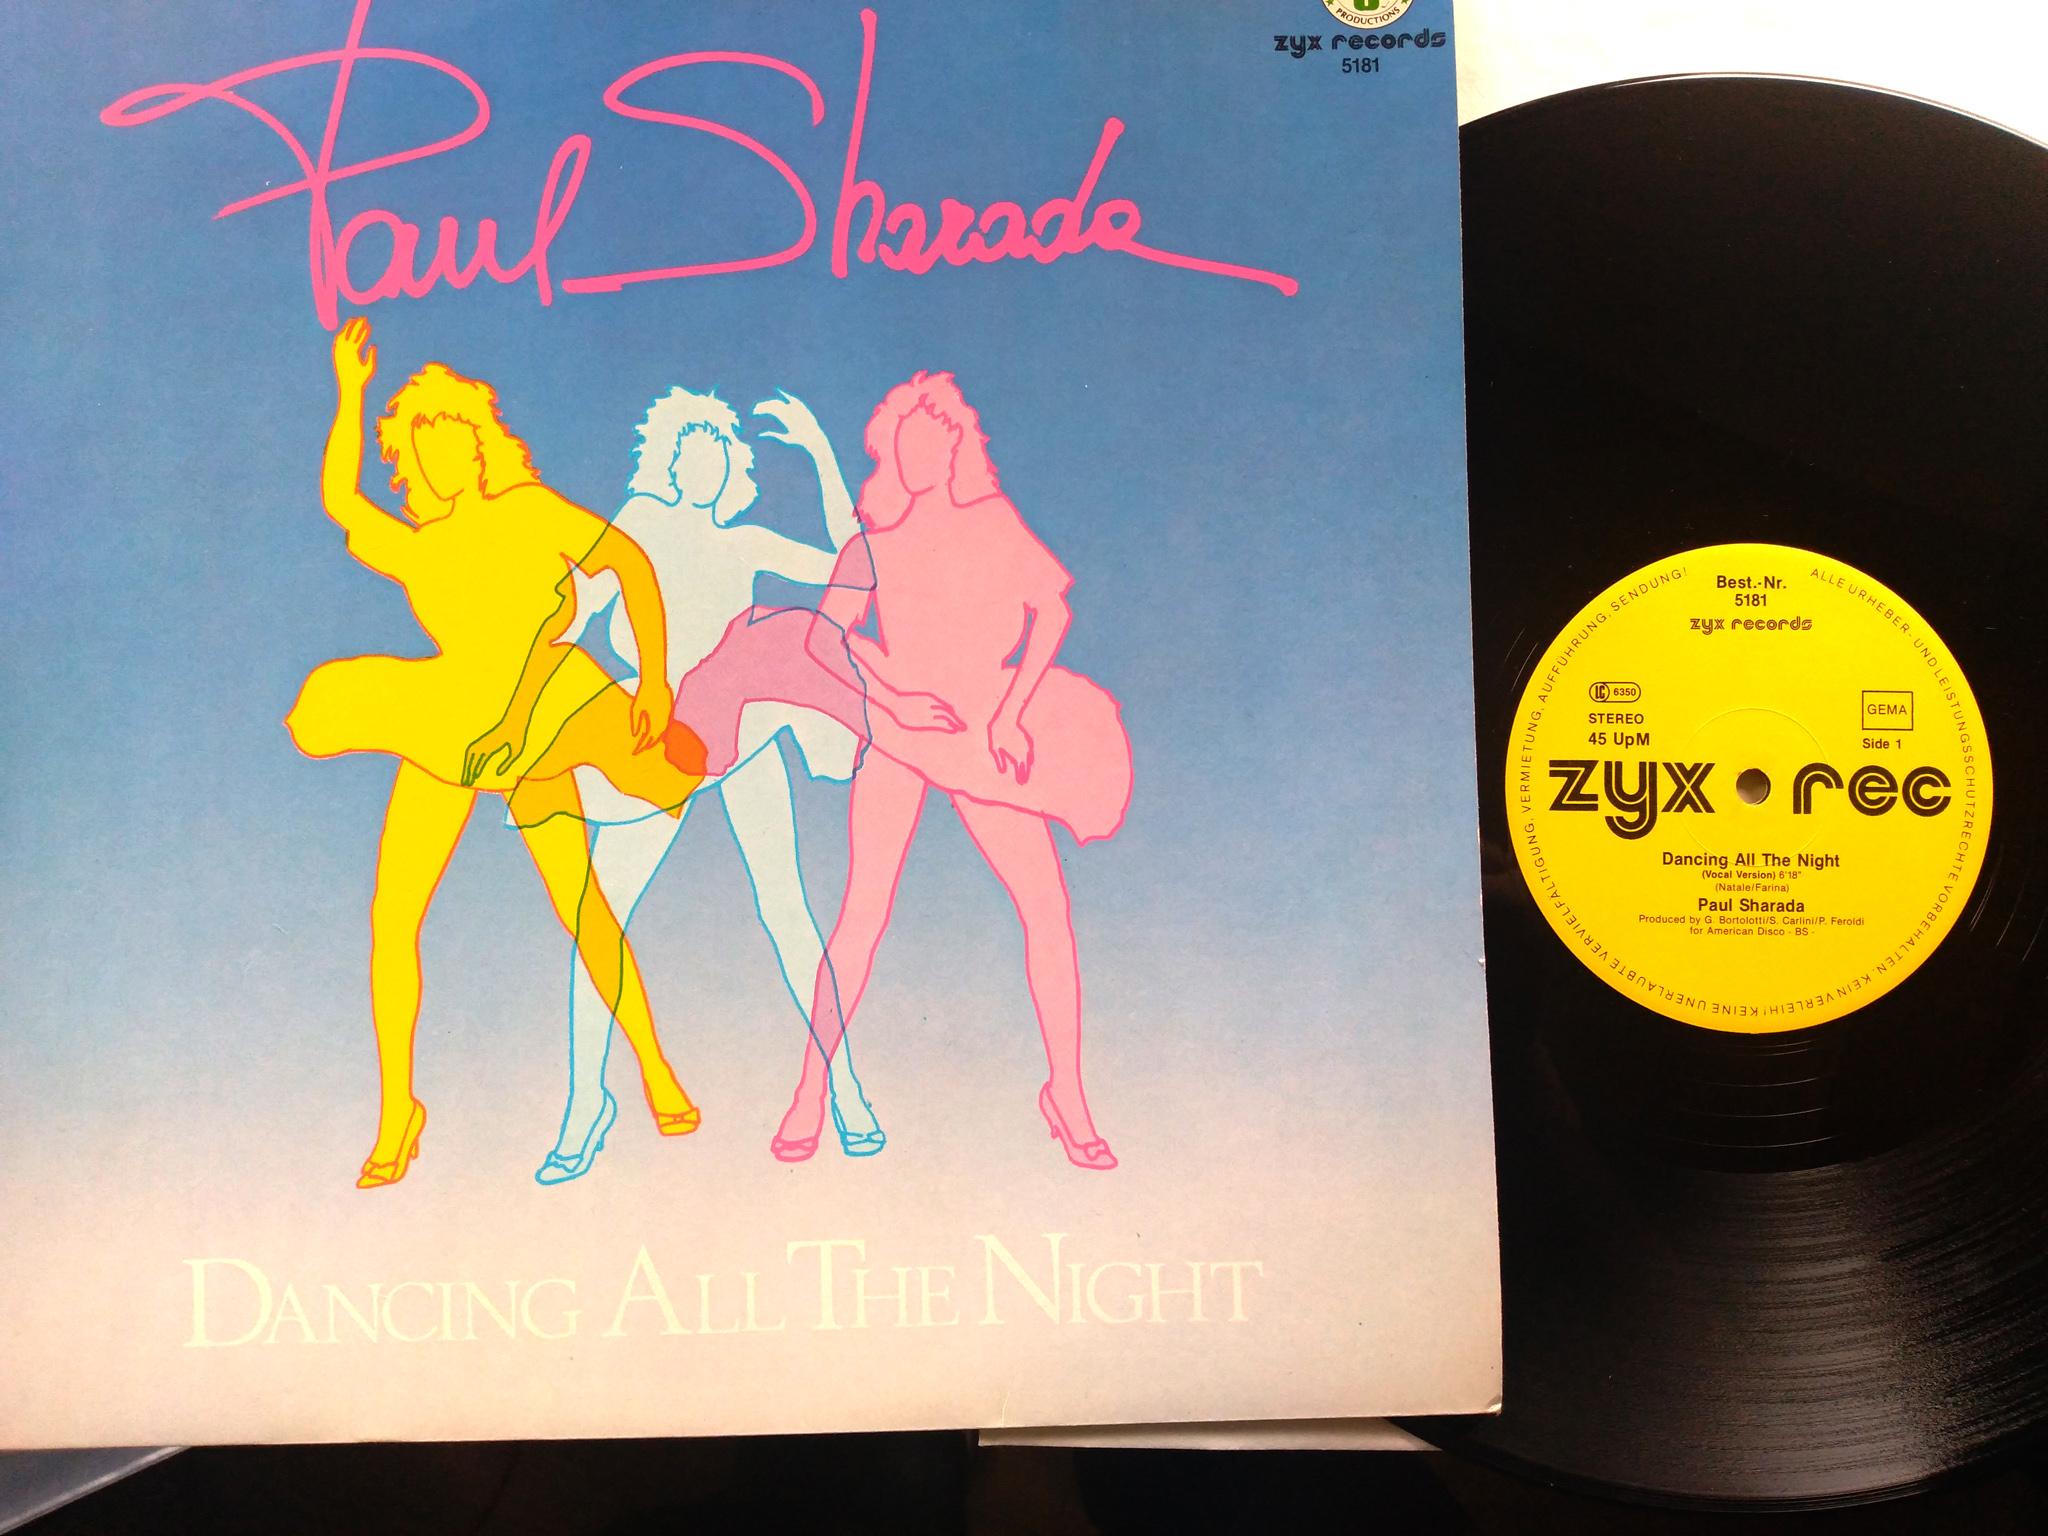 Paul Sharada - Dancing All The Night